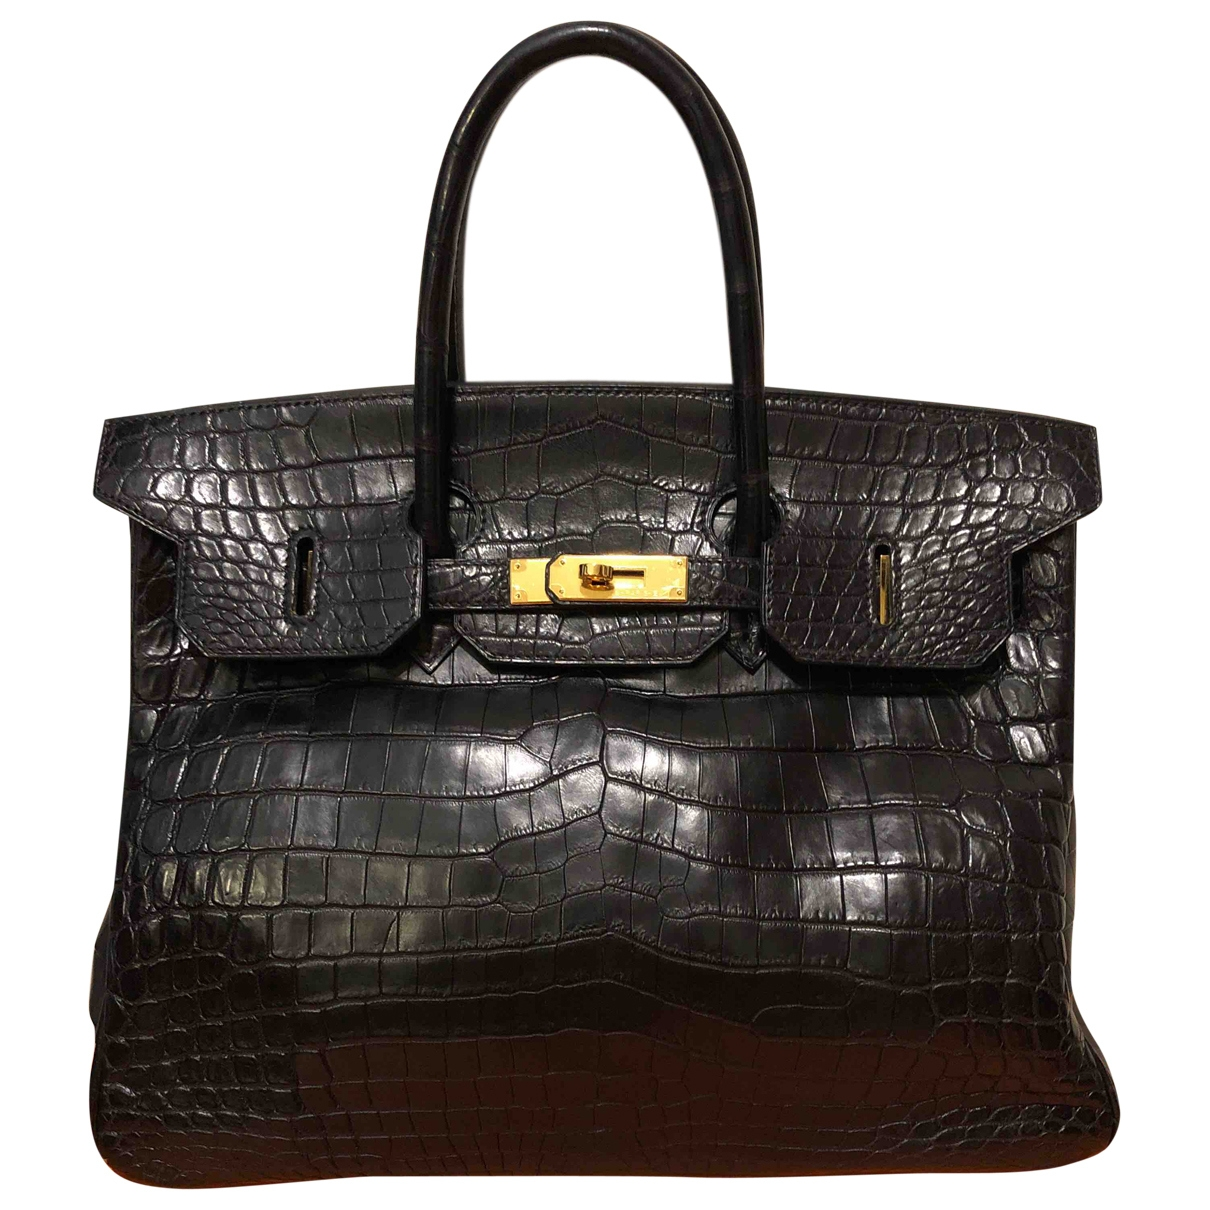 Hermes - Sac a main Birkin 35 pour femme en crocodile - noir